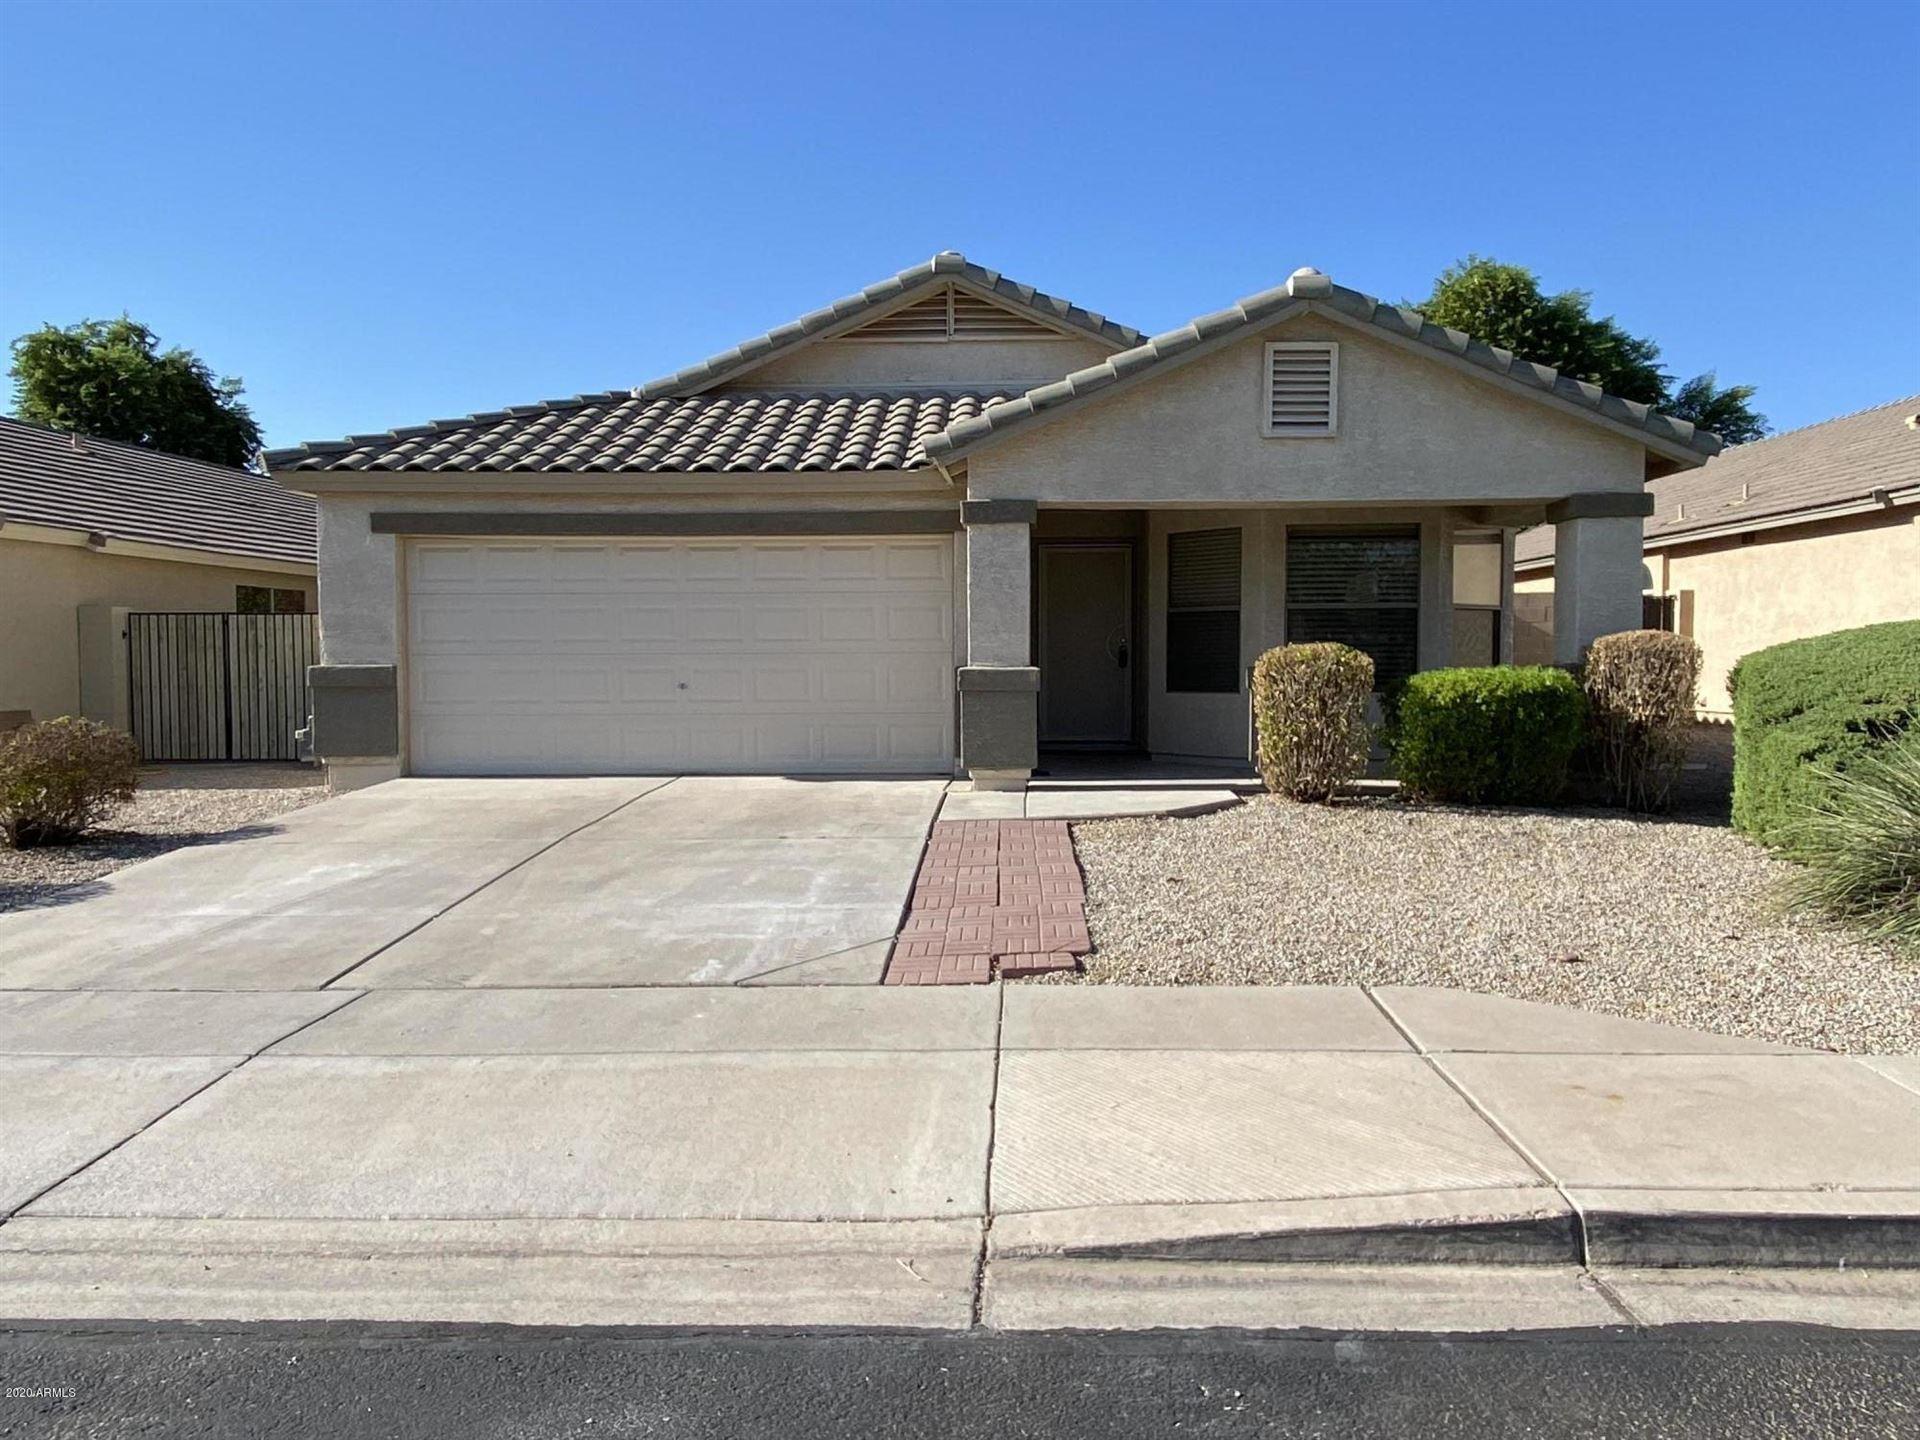 9438 E PLANA Avenue, Mesa, AZ 85212 - MLS#: 6127267